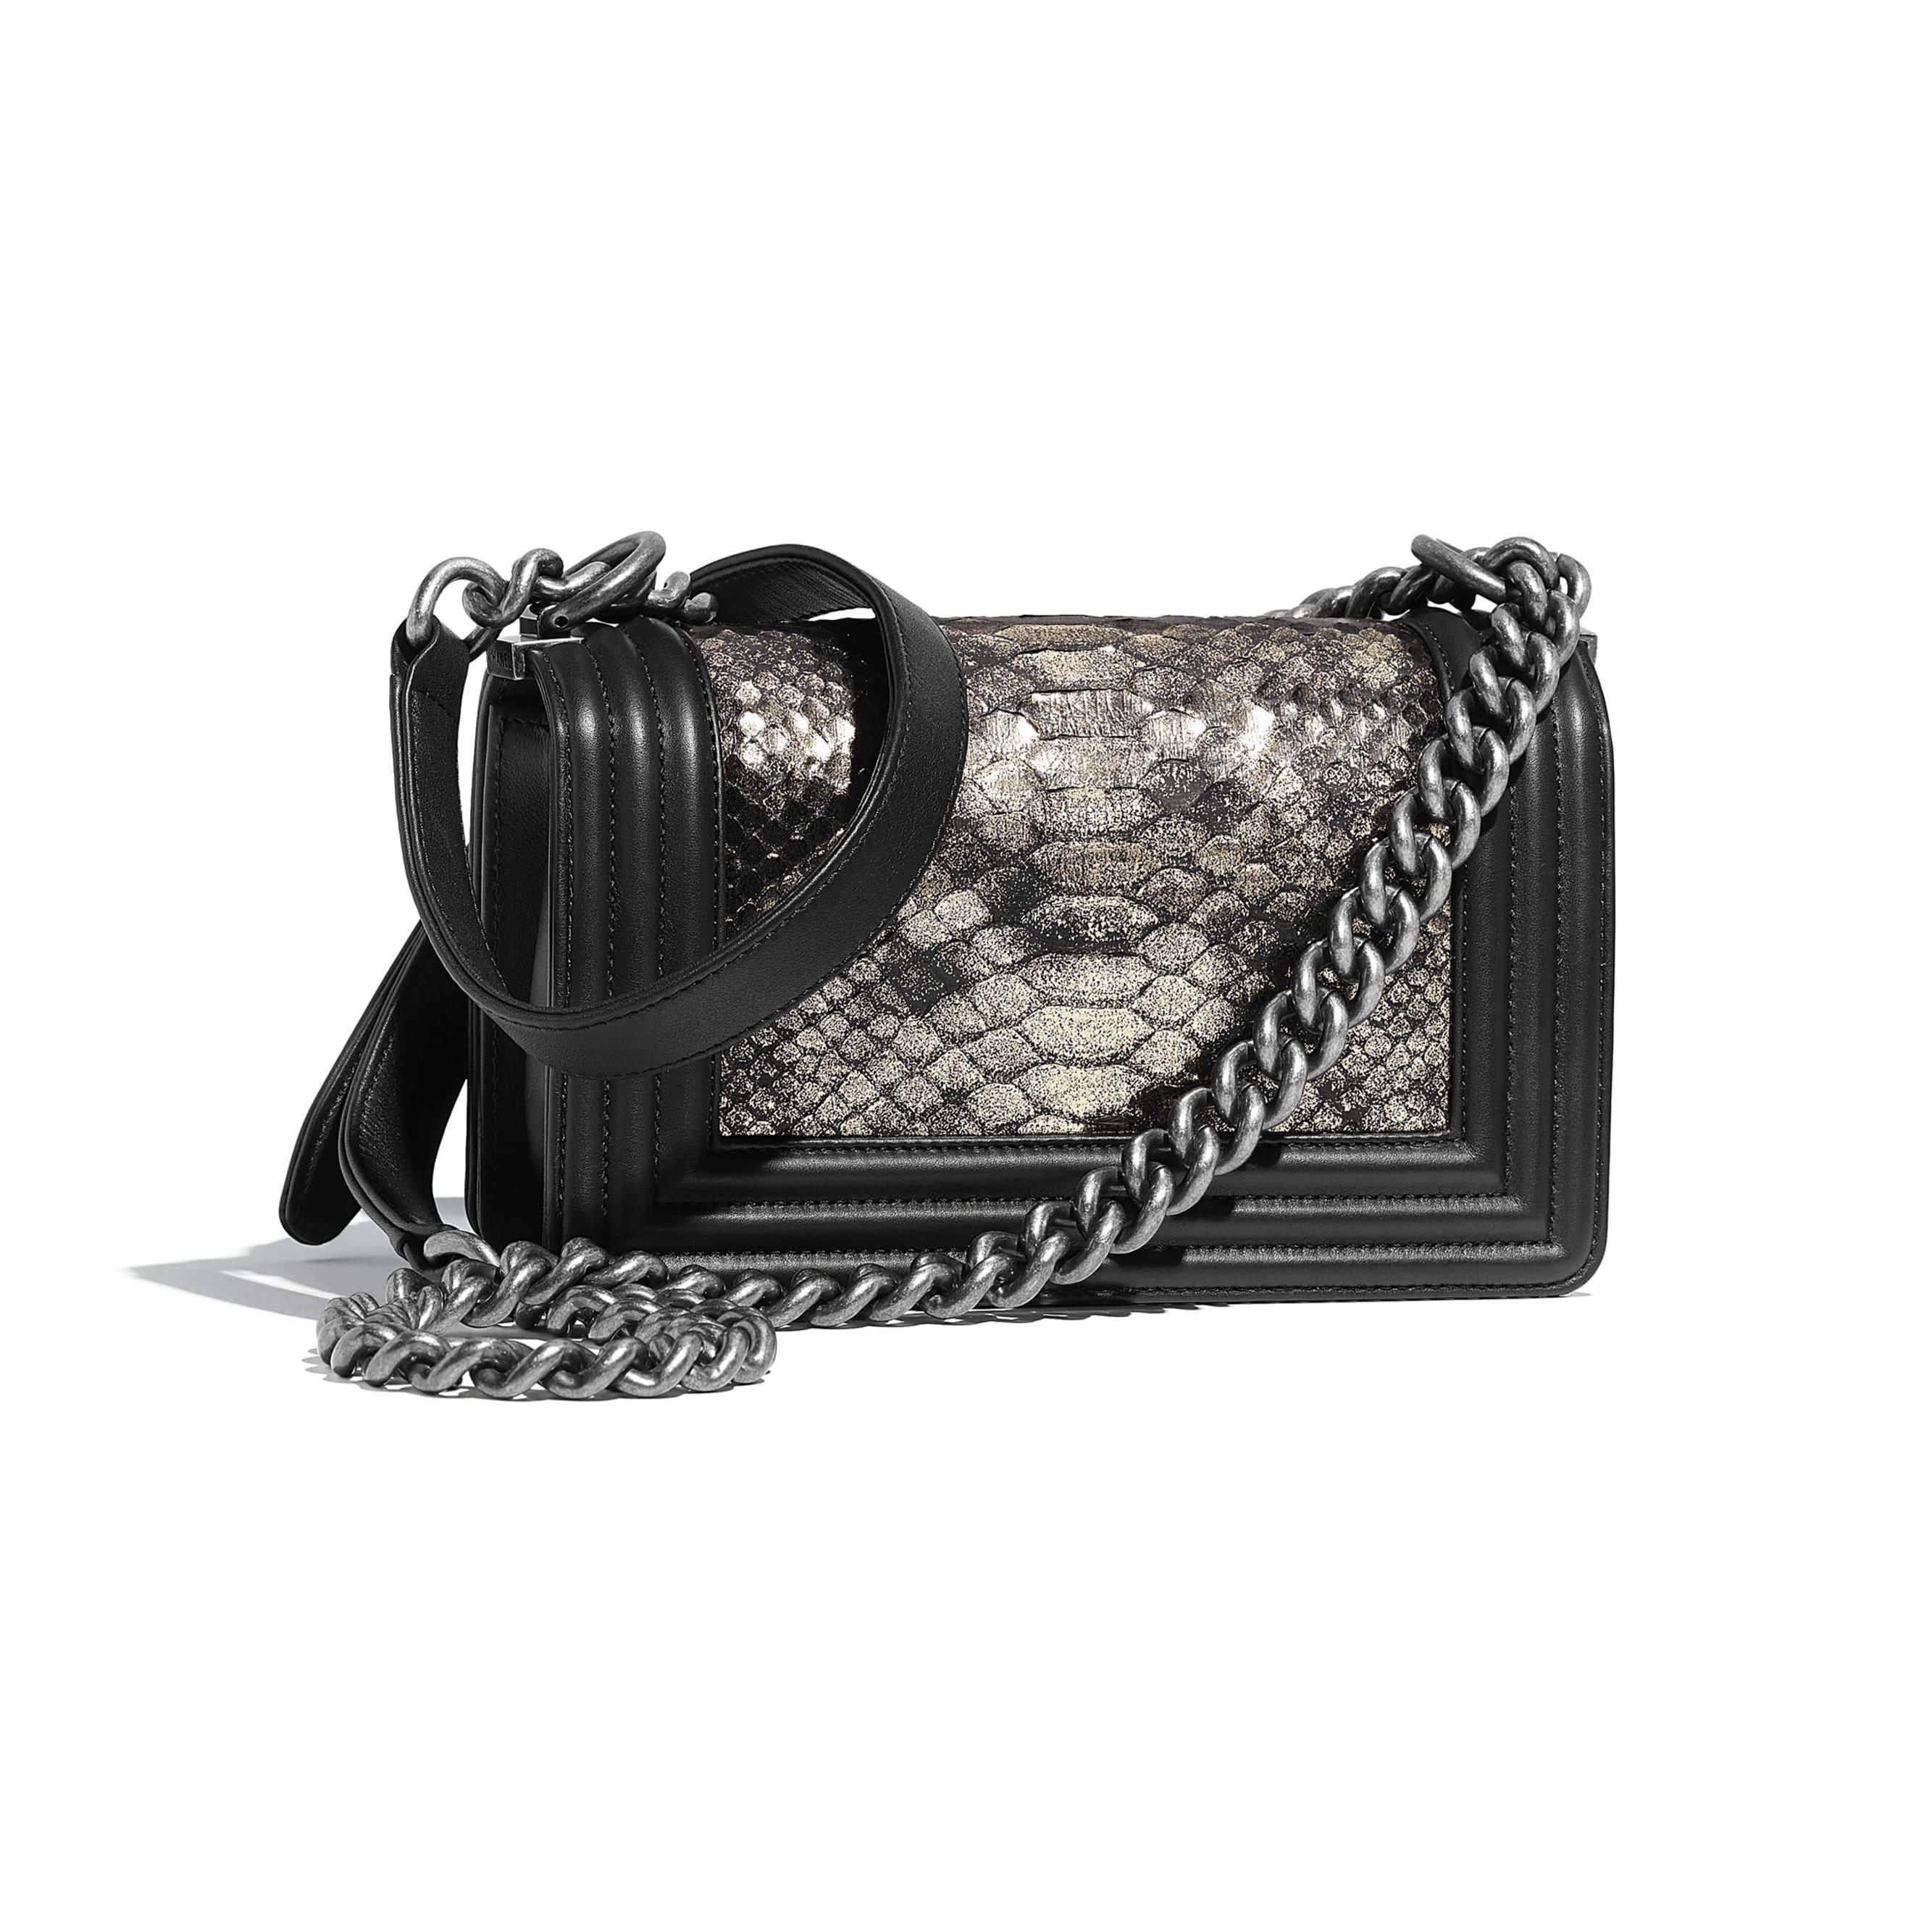 Small BOY CHANEL Handbag - Silver & Black - python, calfskin & ruthenium-finish metal - Alternative view - see standard sized version